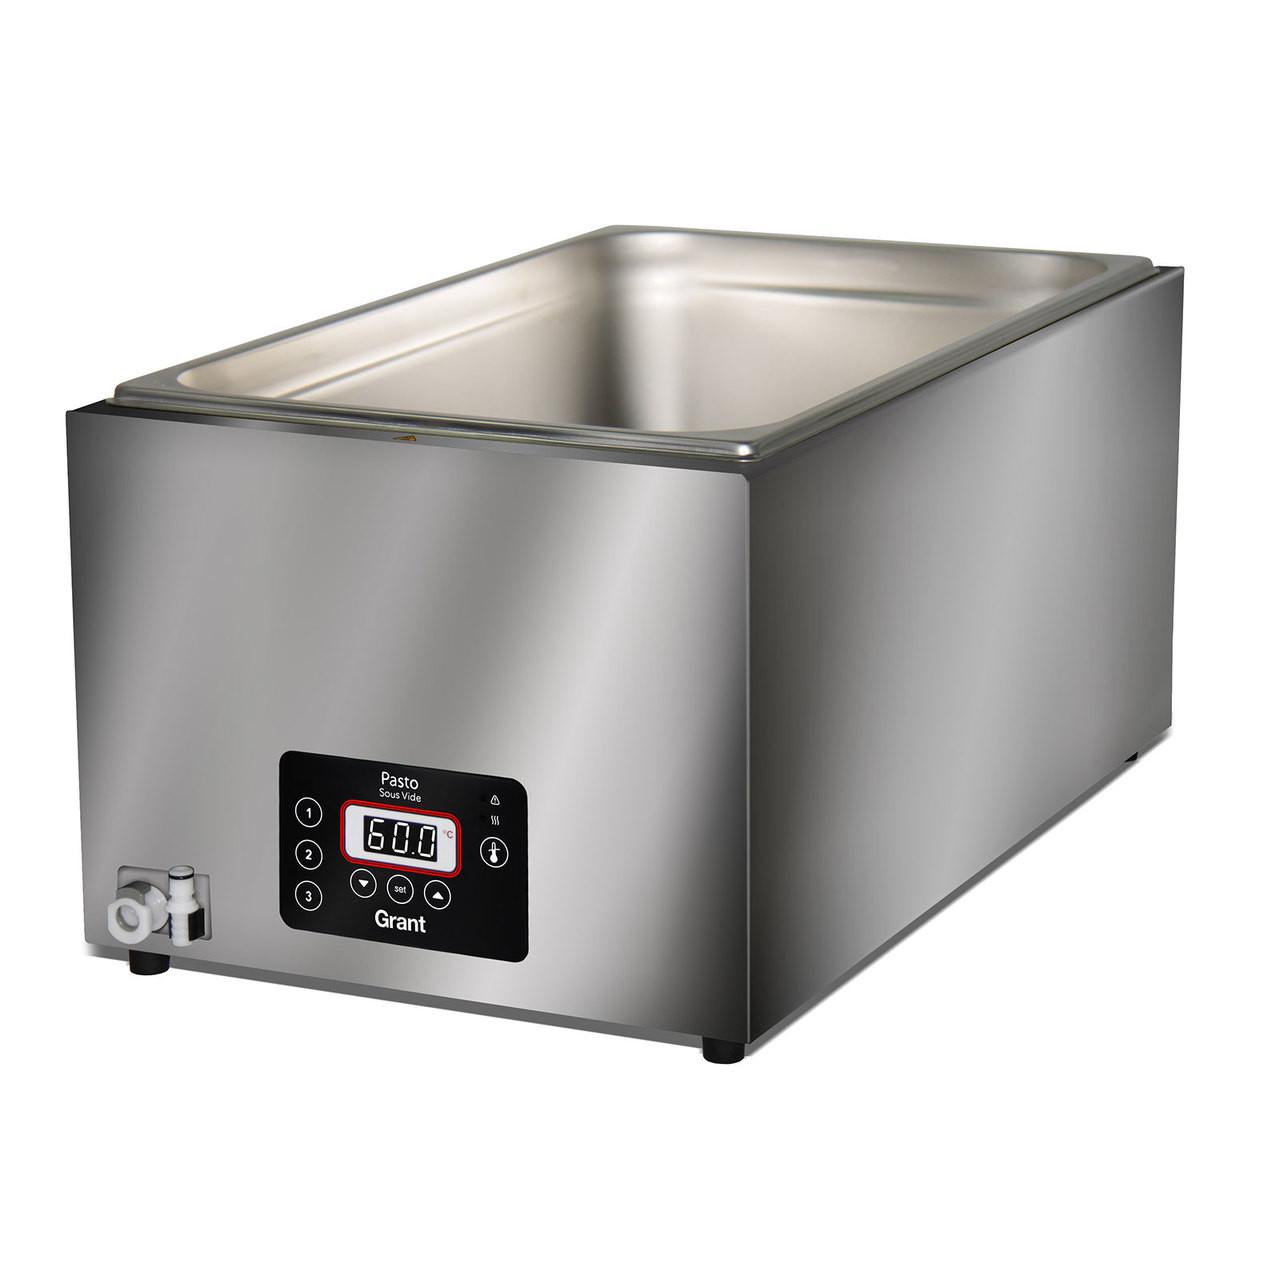 Grant - Pasto Sous Vide Water Bath 26lt - Stainless Steel